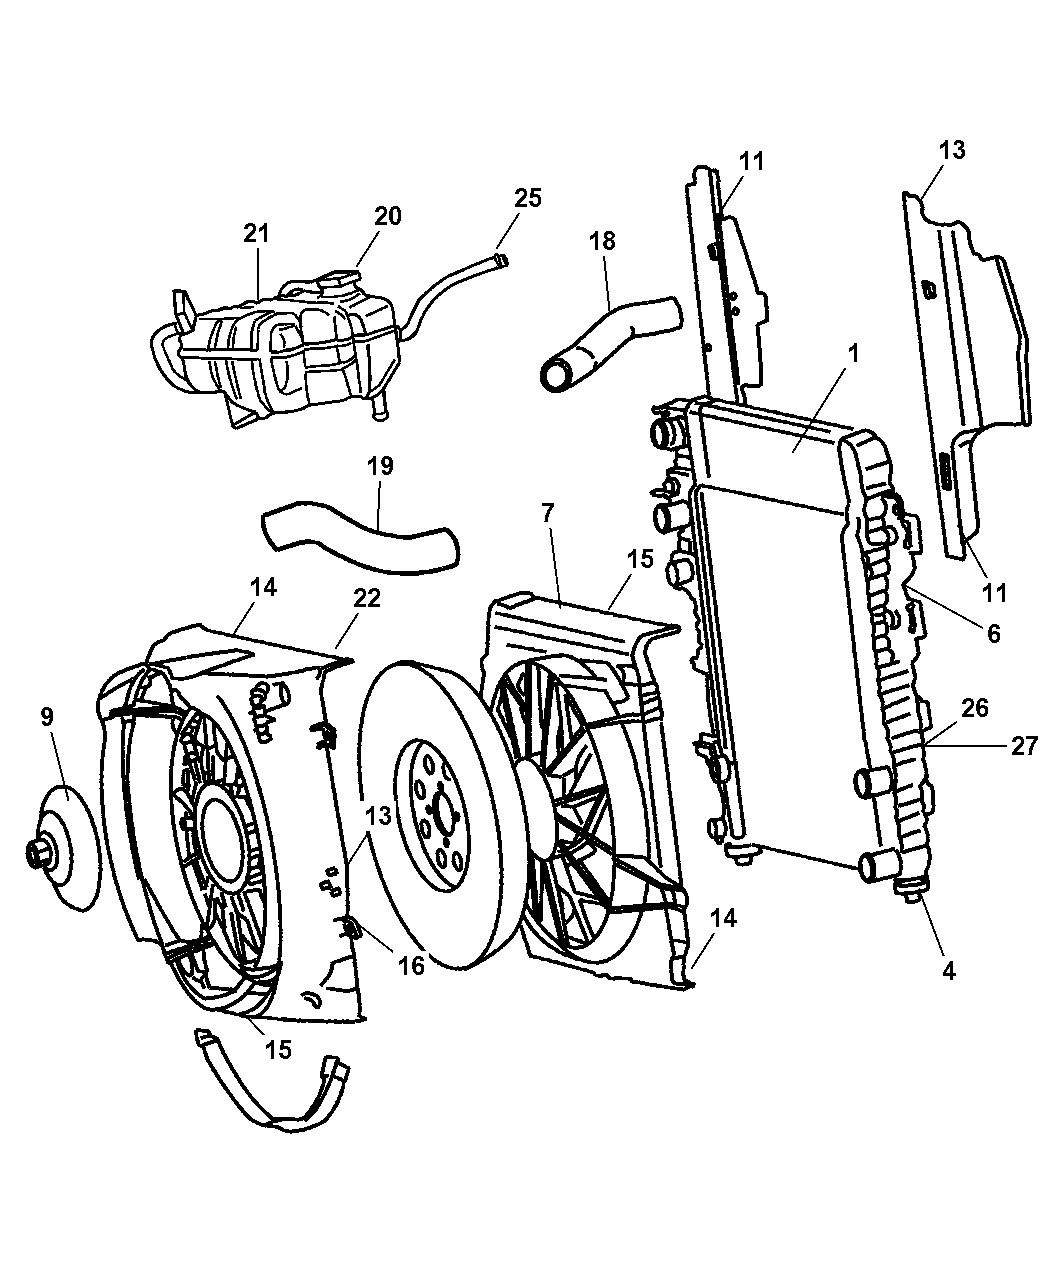 2003 Jeep Liberty 3.7 Cooling Diagram 2003 Jeep Renegade Engine Diagram Cars Wiring Diagram Of 2003 Jeep Liberty 3.7 Cooling Diagram